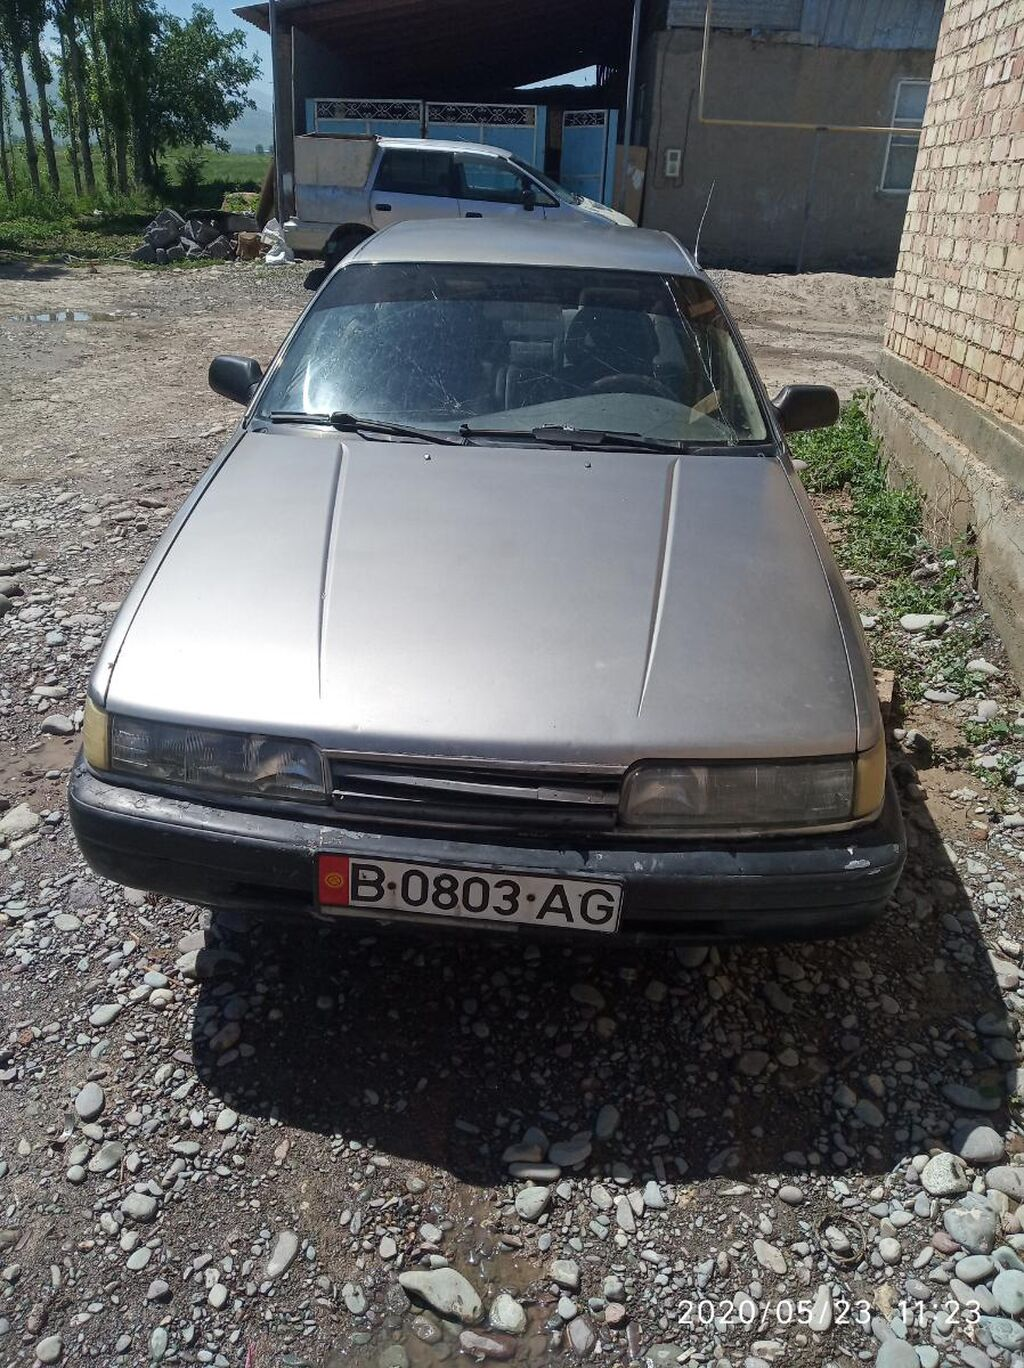 Mazda 626 2 л. 1989 | 88556558 км